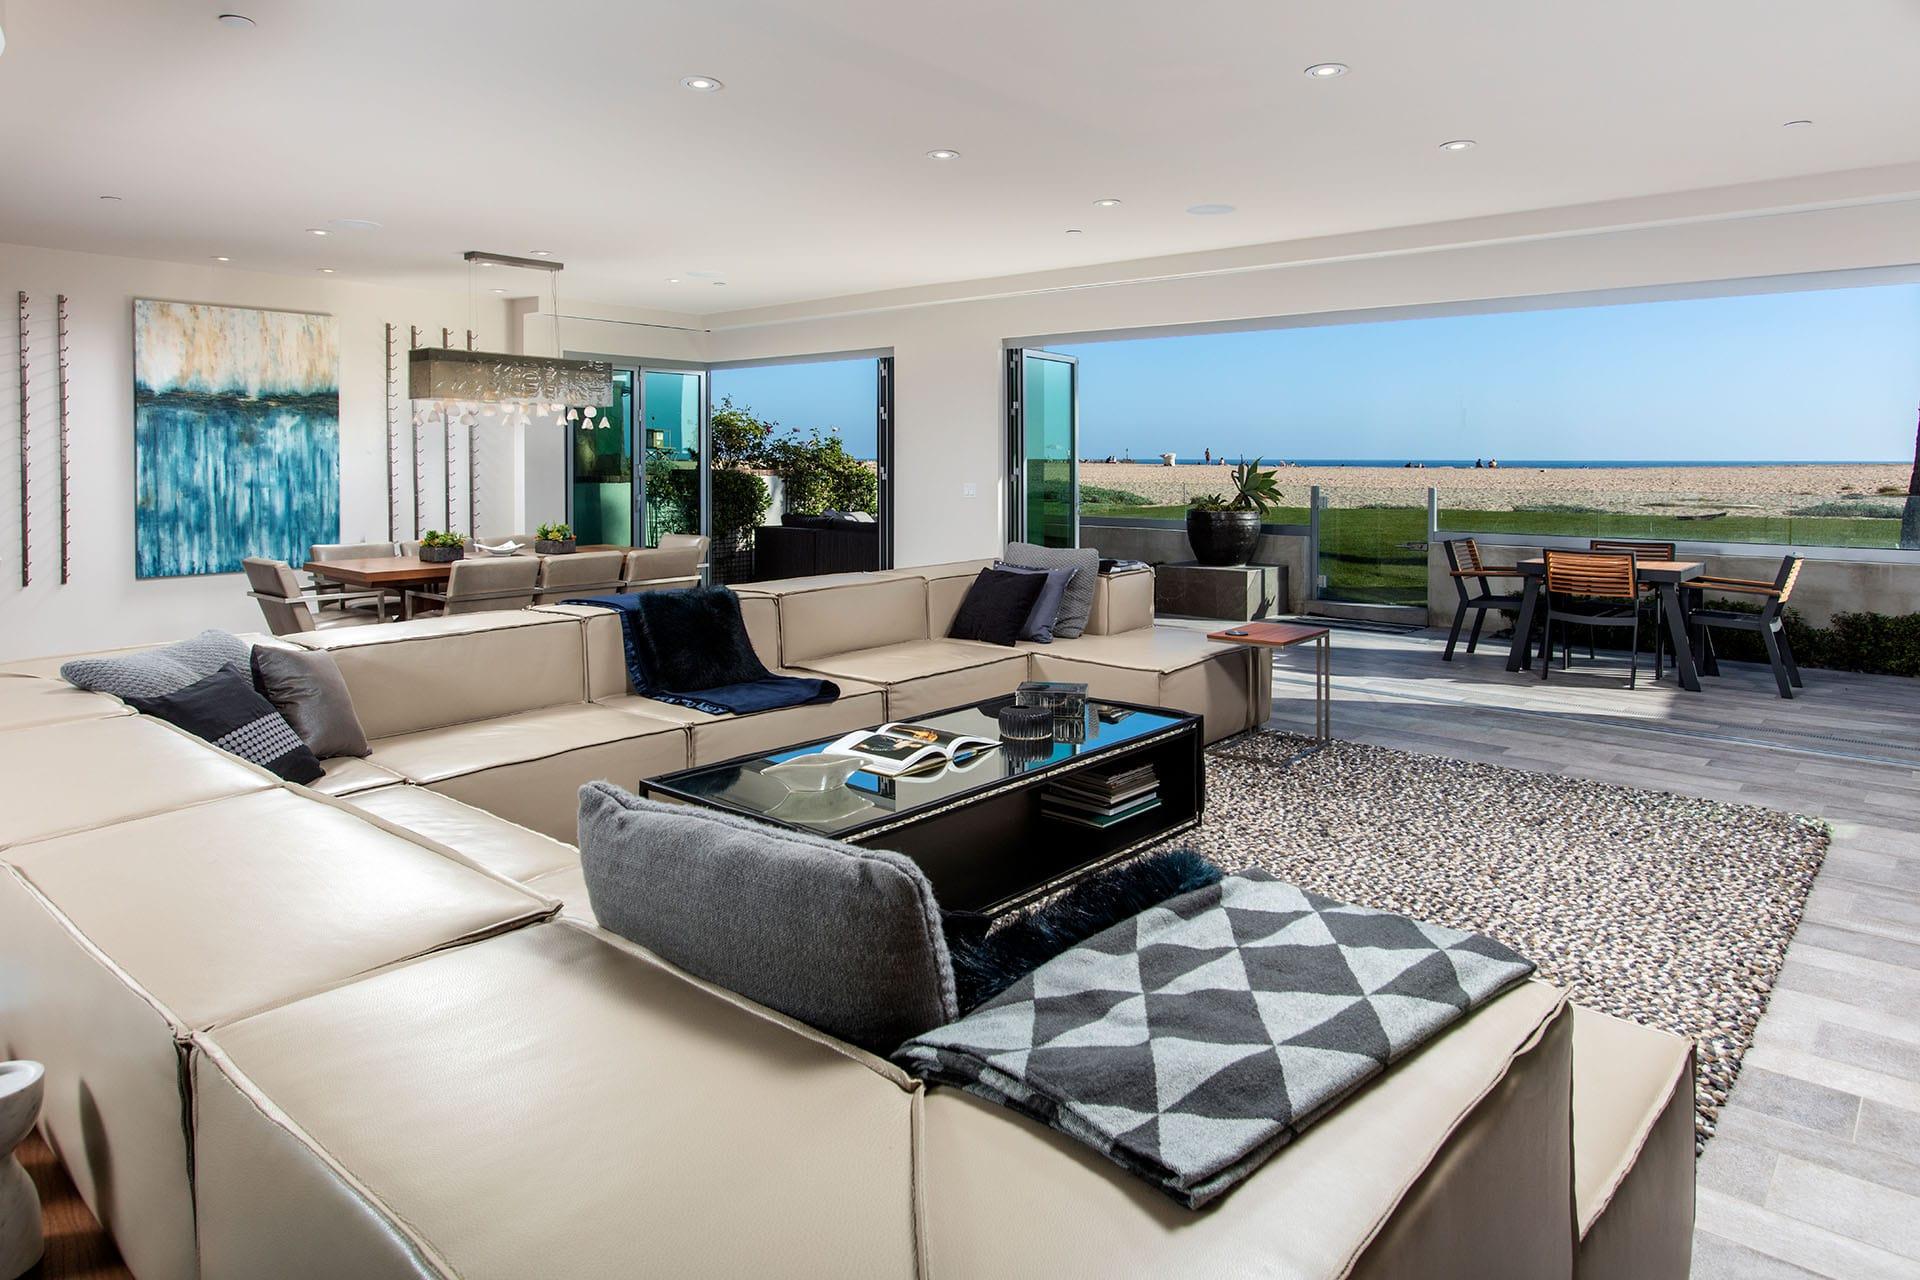 newport beach contemporary beach house living room.jpg